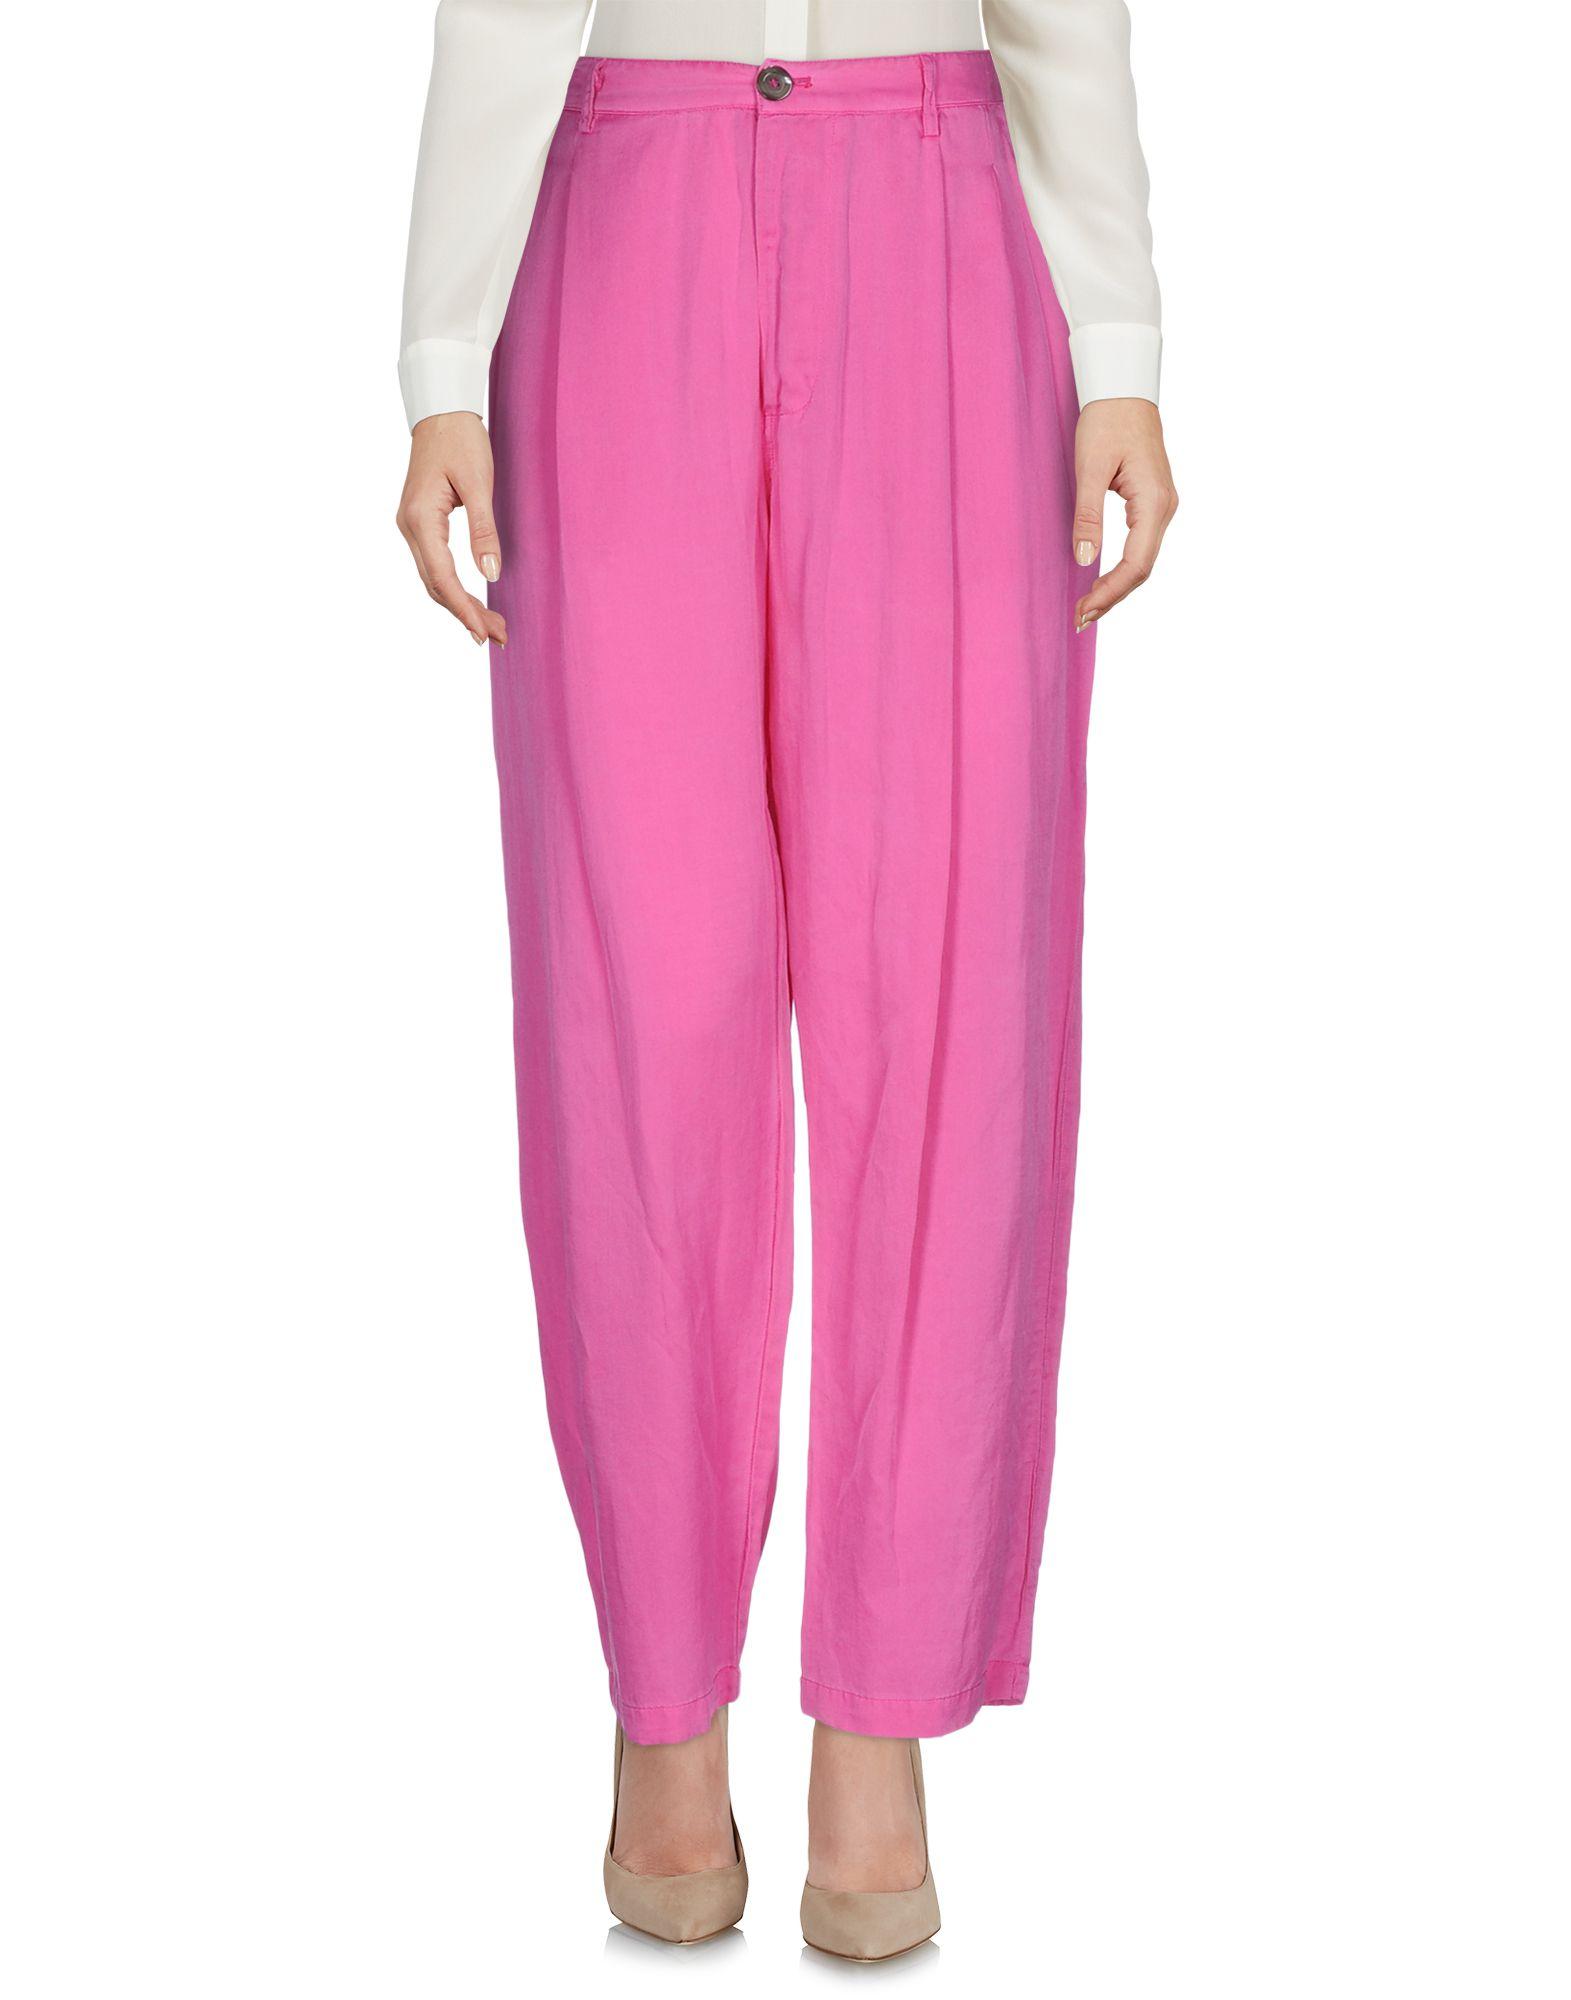 Pantalone Gerard Donna - Acquista online su